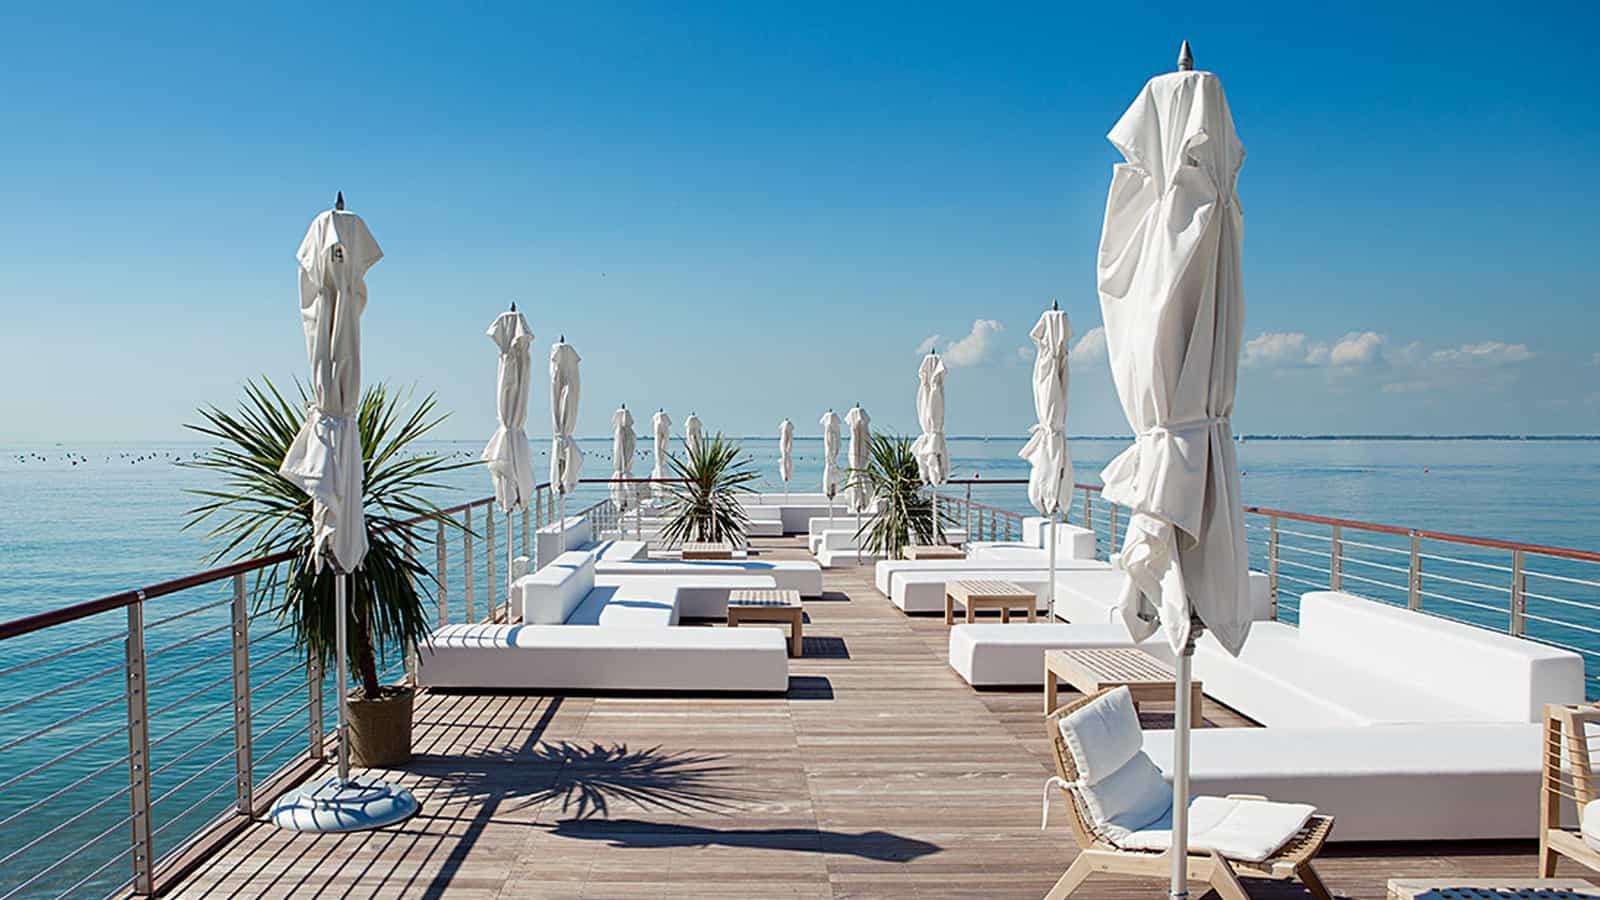 Beautiful Le Terrazze Villorba Spa Pictures - Design Trends 2017 ...